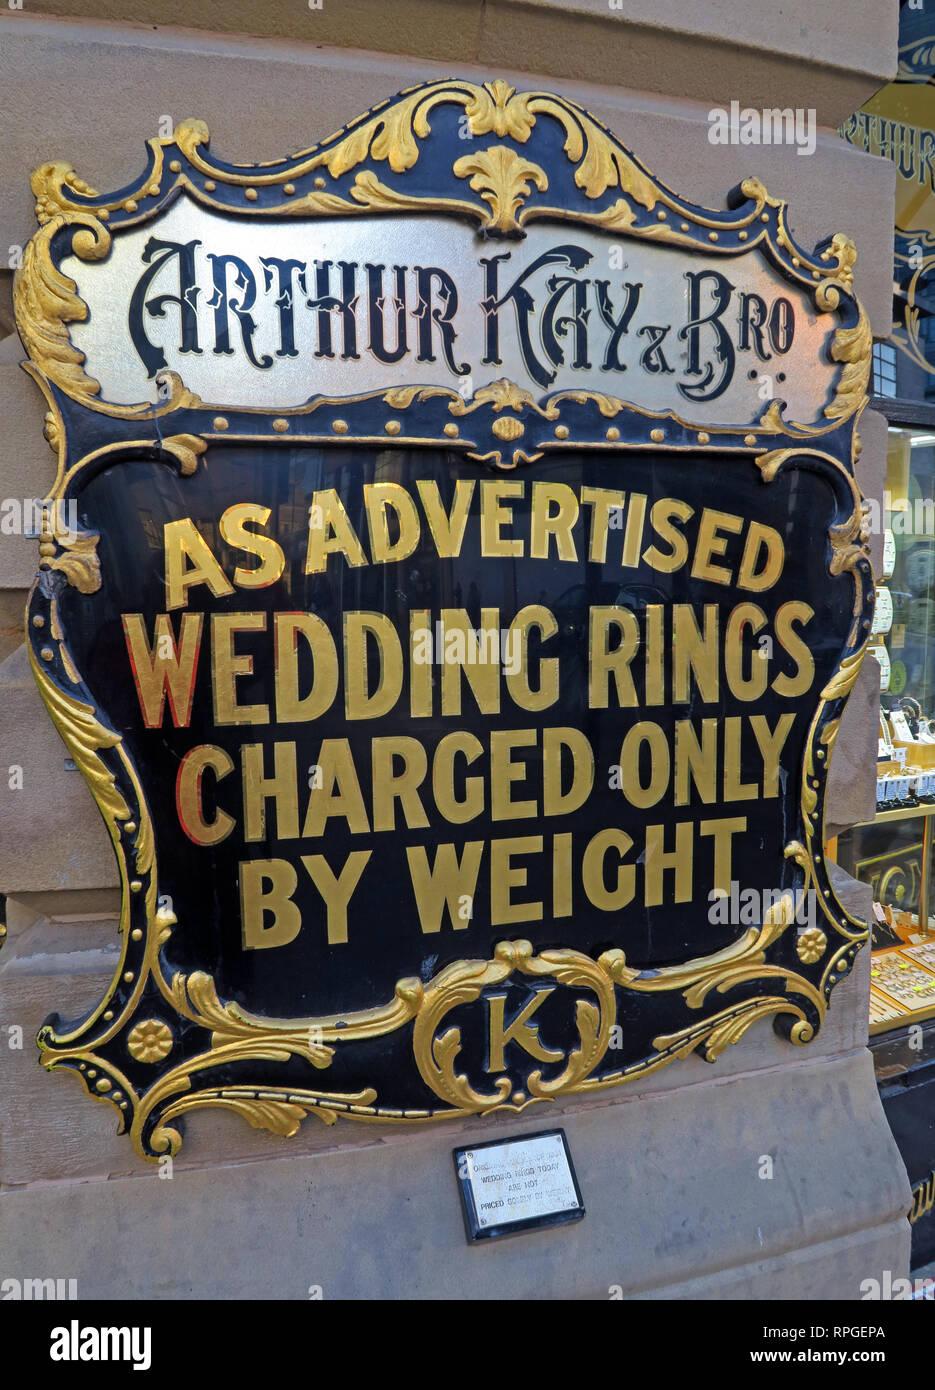 Laden Sie dieses Alamy Stockfoto Arthur Kay & Bros, Juweliere Shop, 2 New Market, Manchester, North West England, UK, M 1 1 PT - RPGEPA